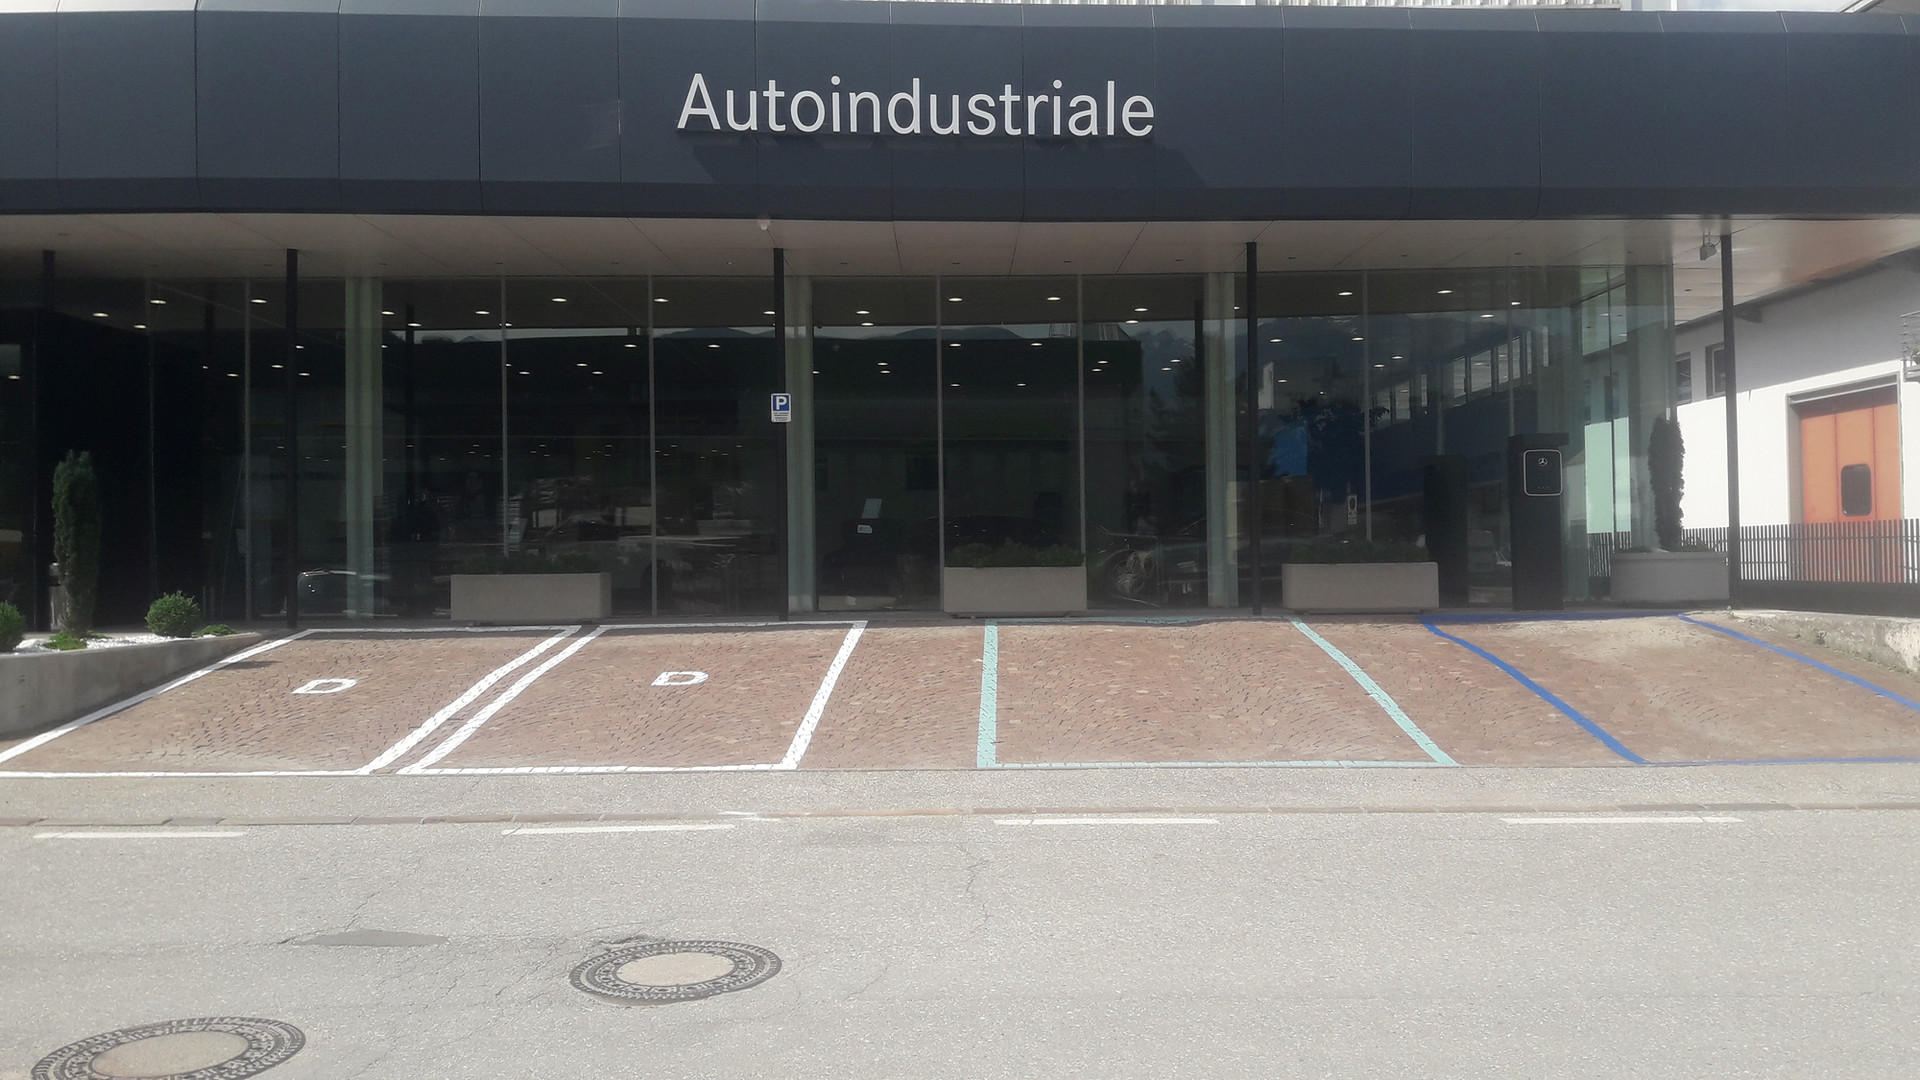 Autoindustriale - Bruneck